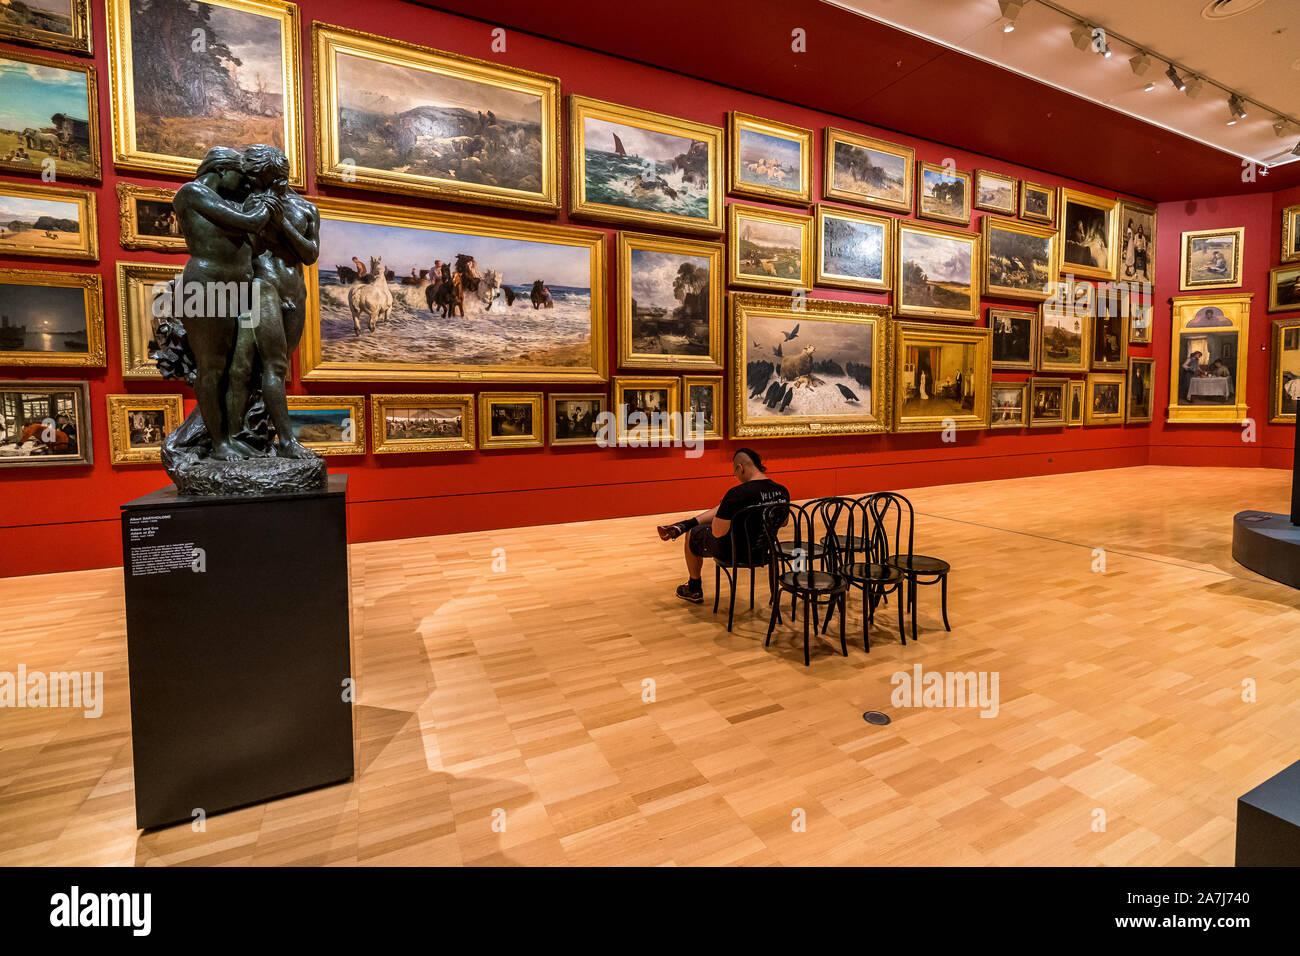 2 Nov 19. Melbourne, Victoria. 19th Century European Salon in the National Gallery of Victoria Stock Photo